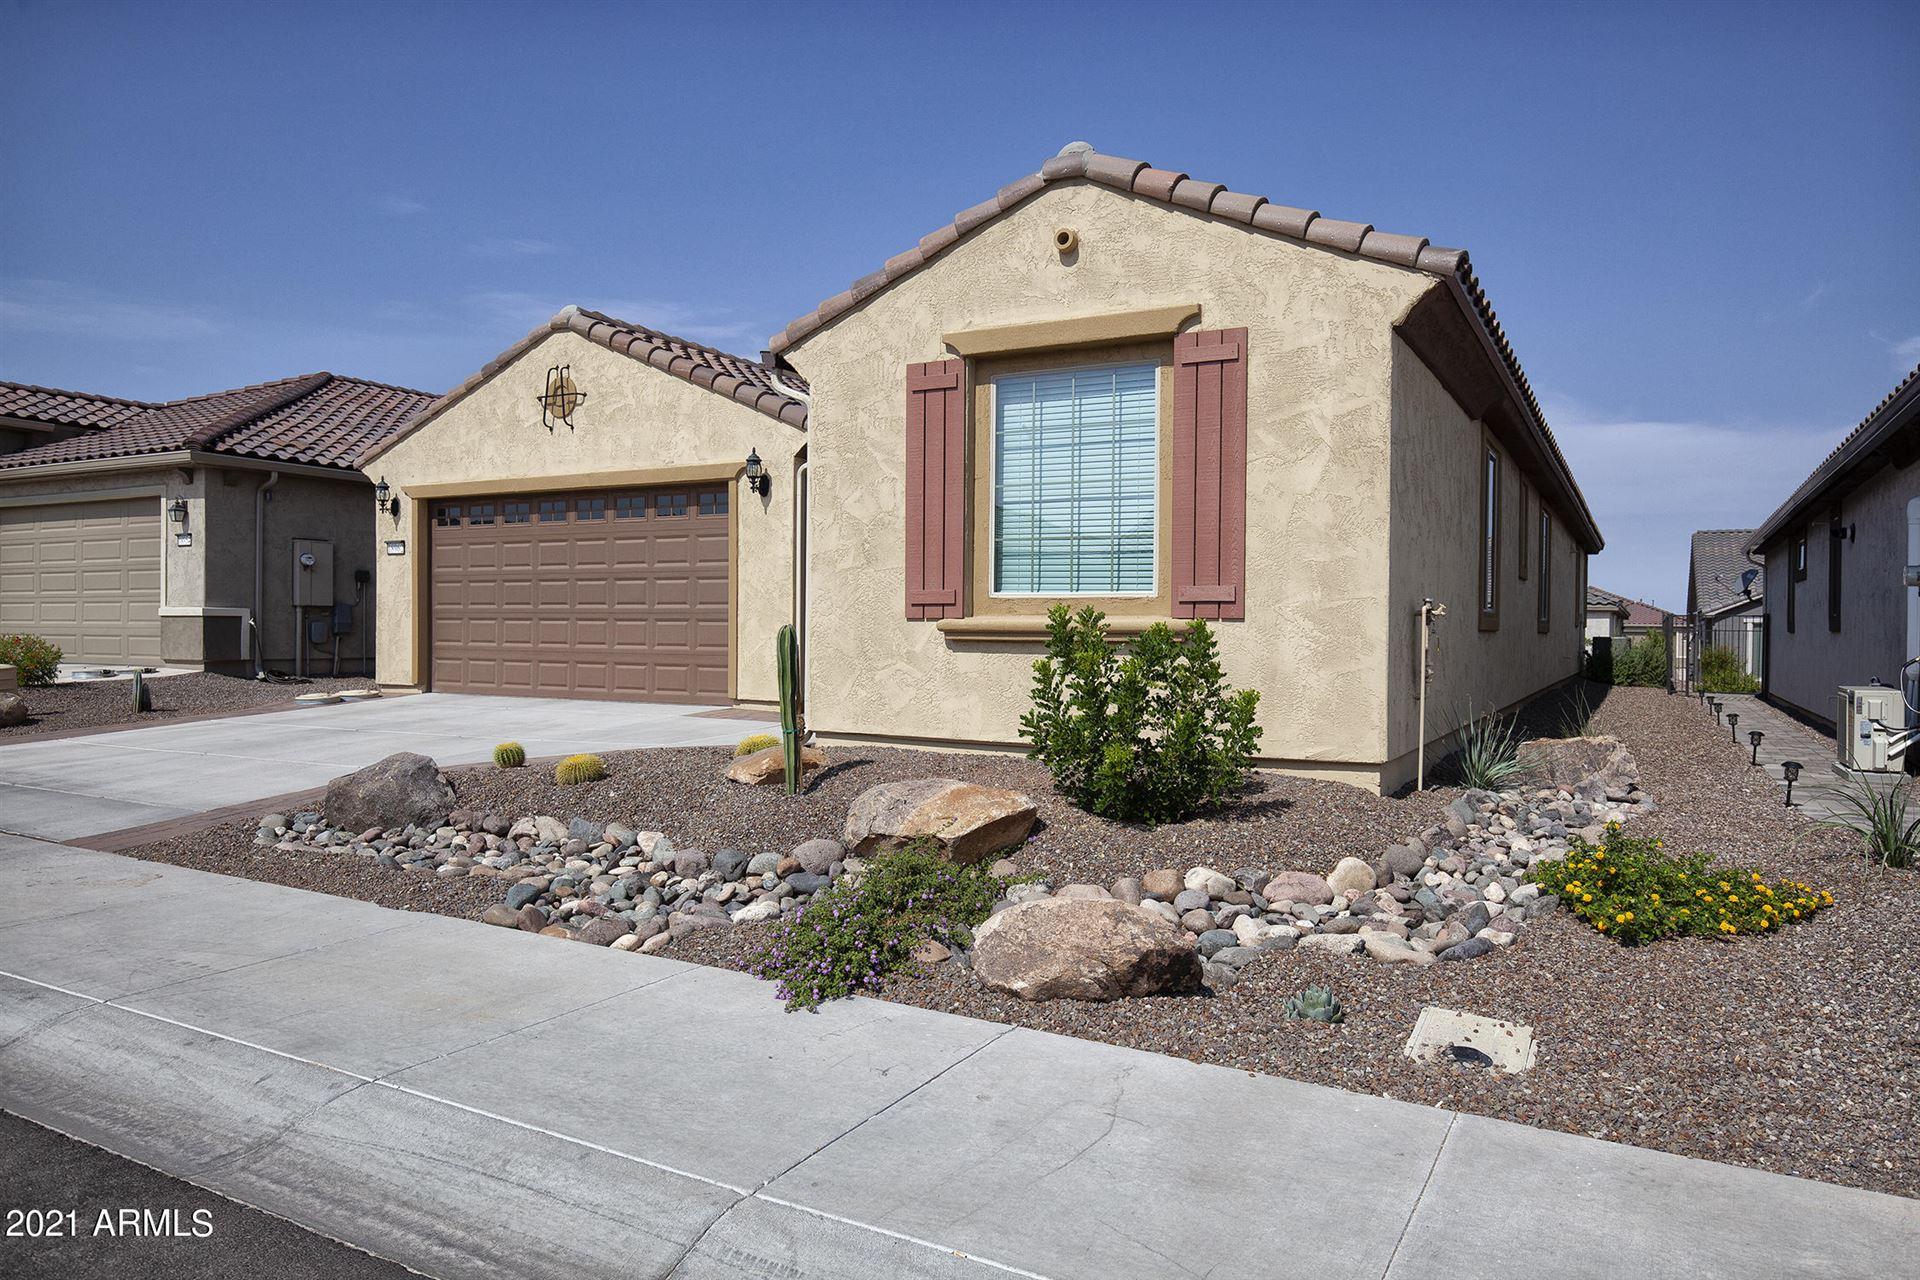 Photo of 18962 N 259TH Avenue, Buckeye, AZ 85396 (MLS # 6268227)